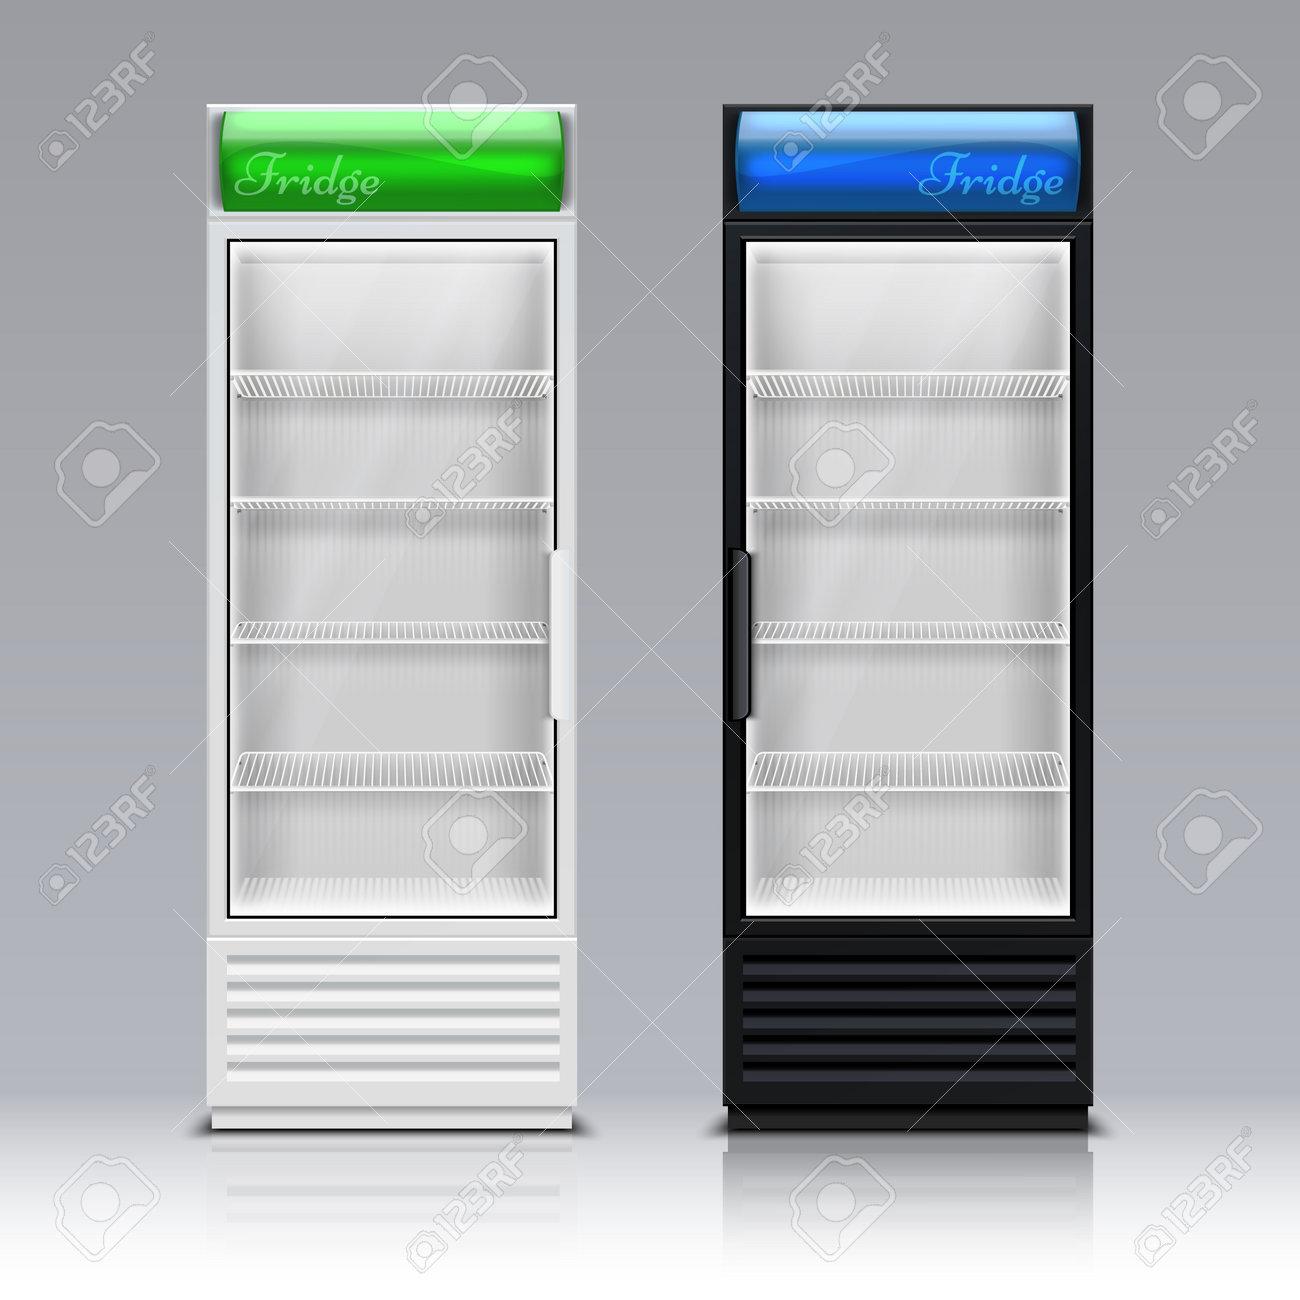 Modern commercial display fridge. Supermarket freezer equipment for drinks vector template. Refrigerator equipment for supermarket, appliance freeze for beverage and food illustration - 167212518